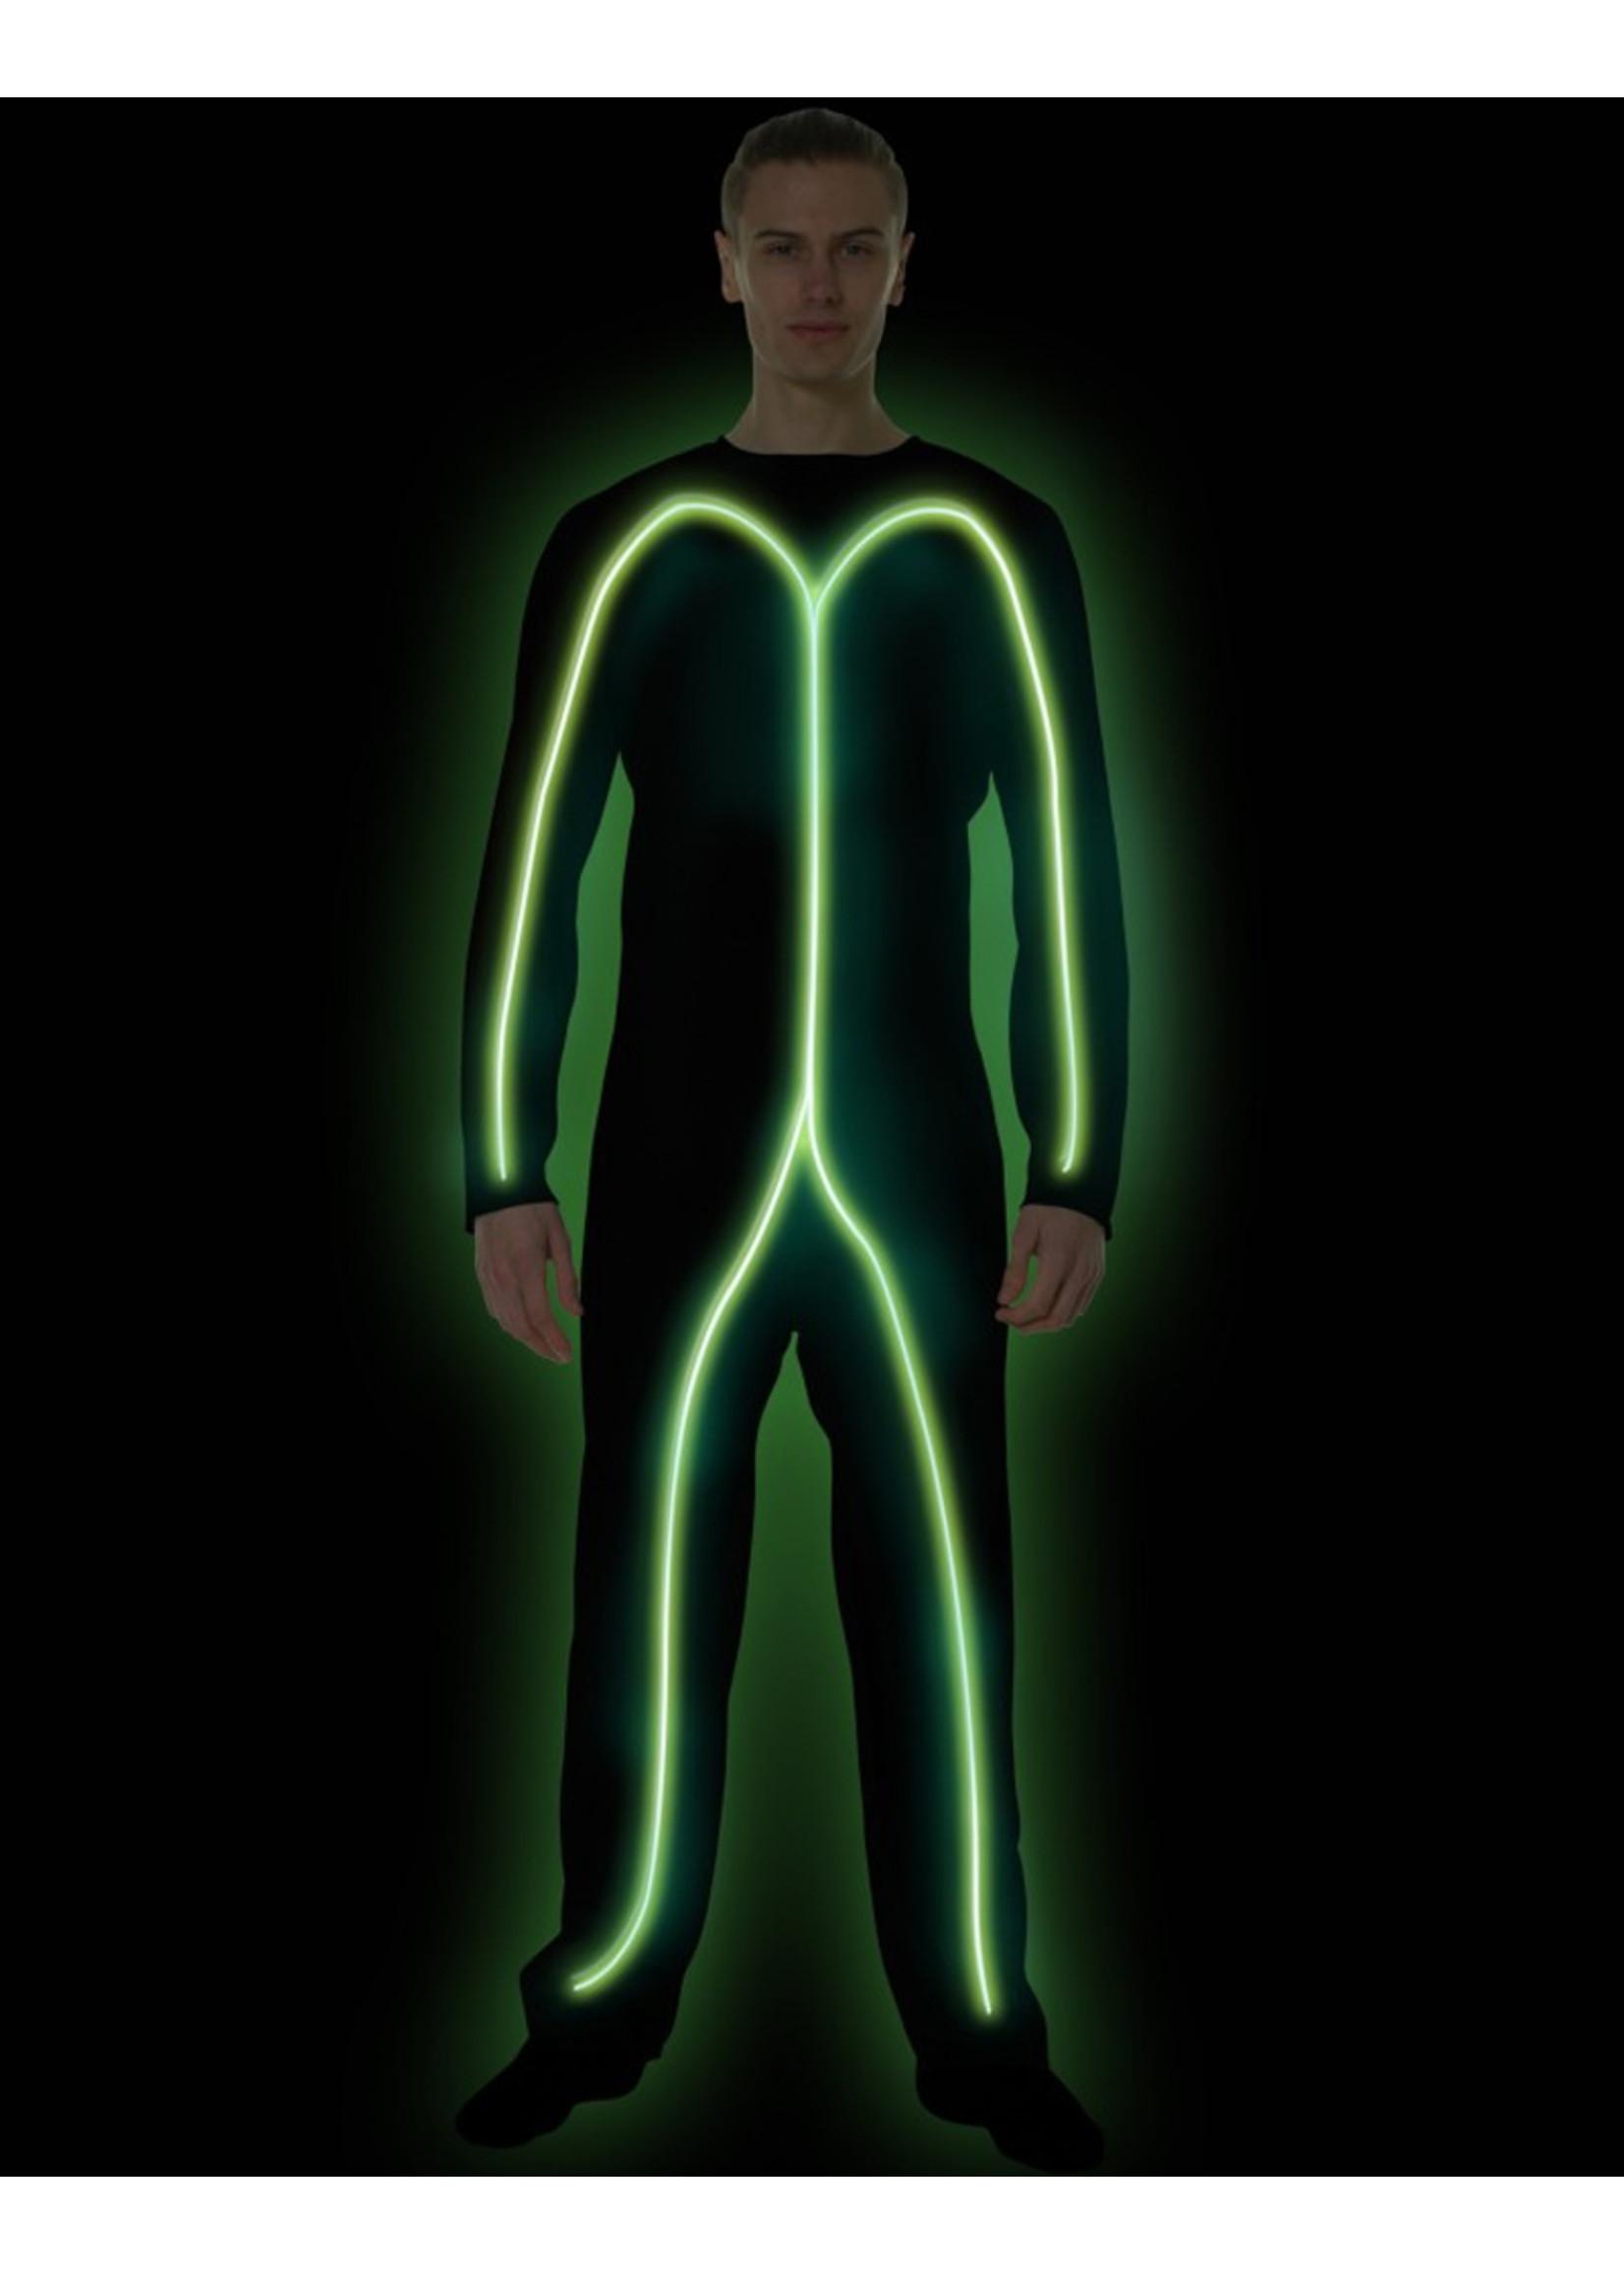 Green Glow Stick Man - Adult